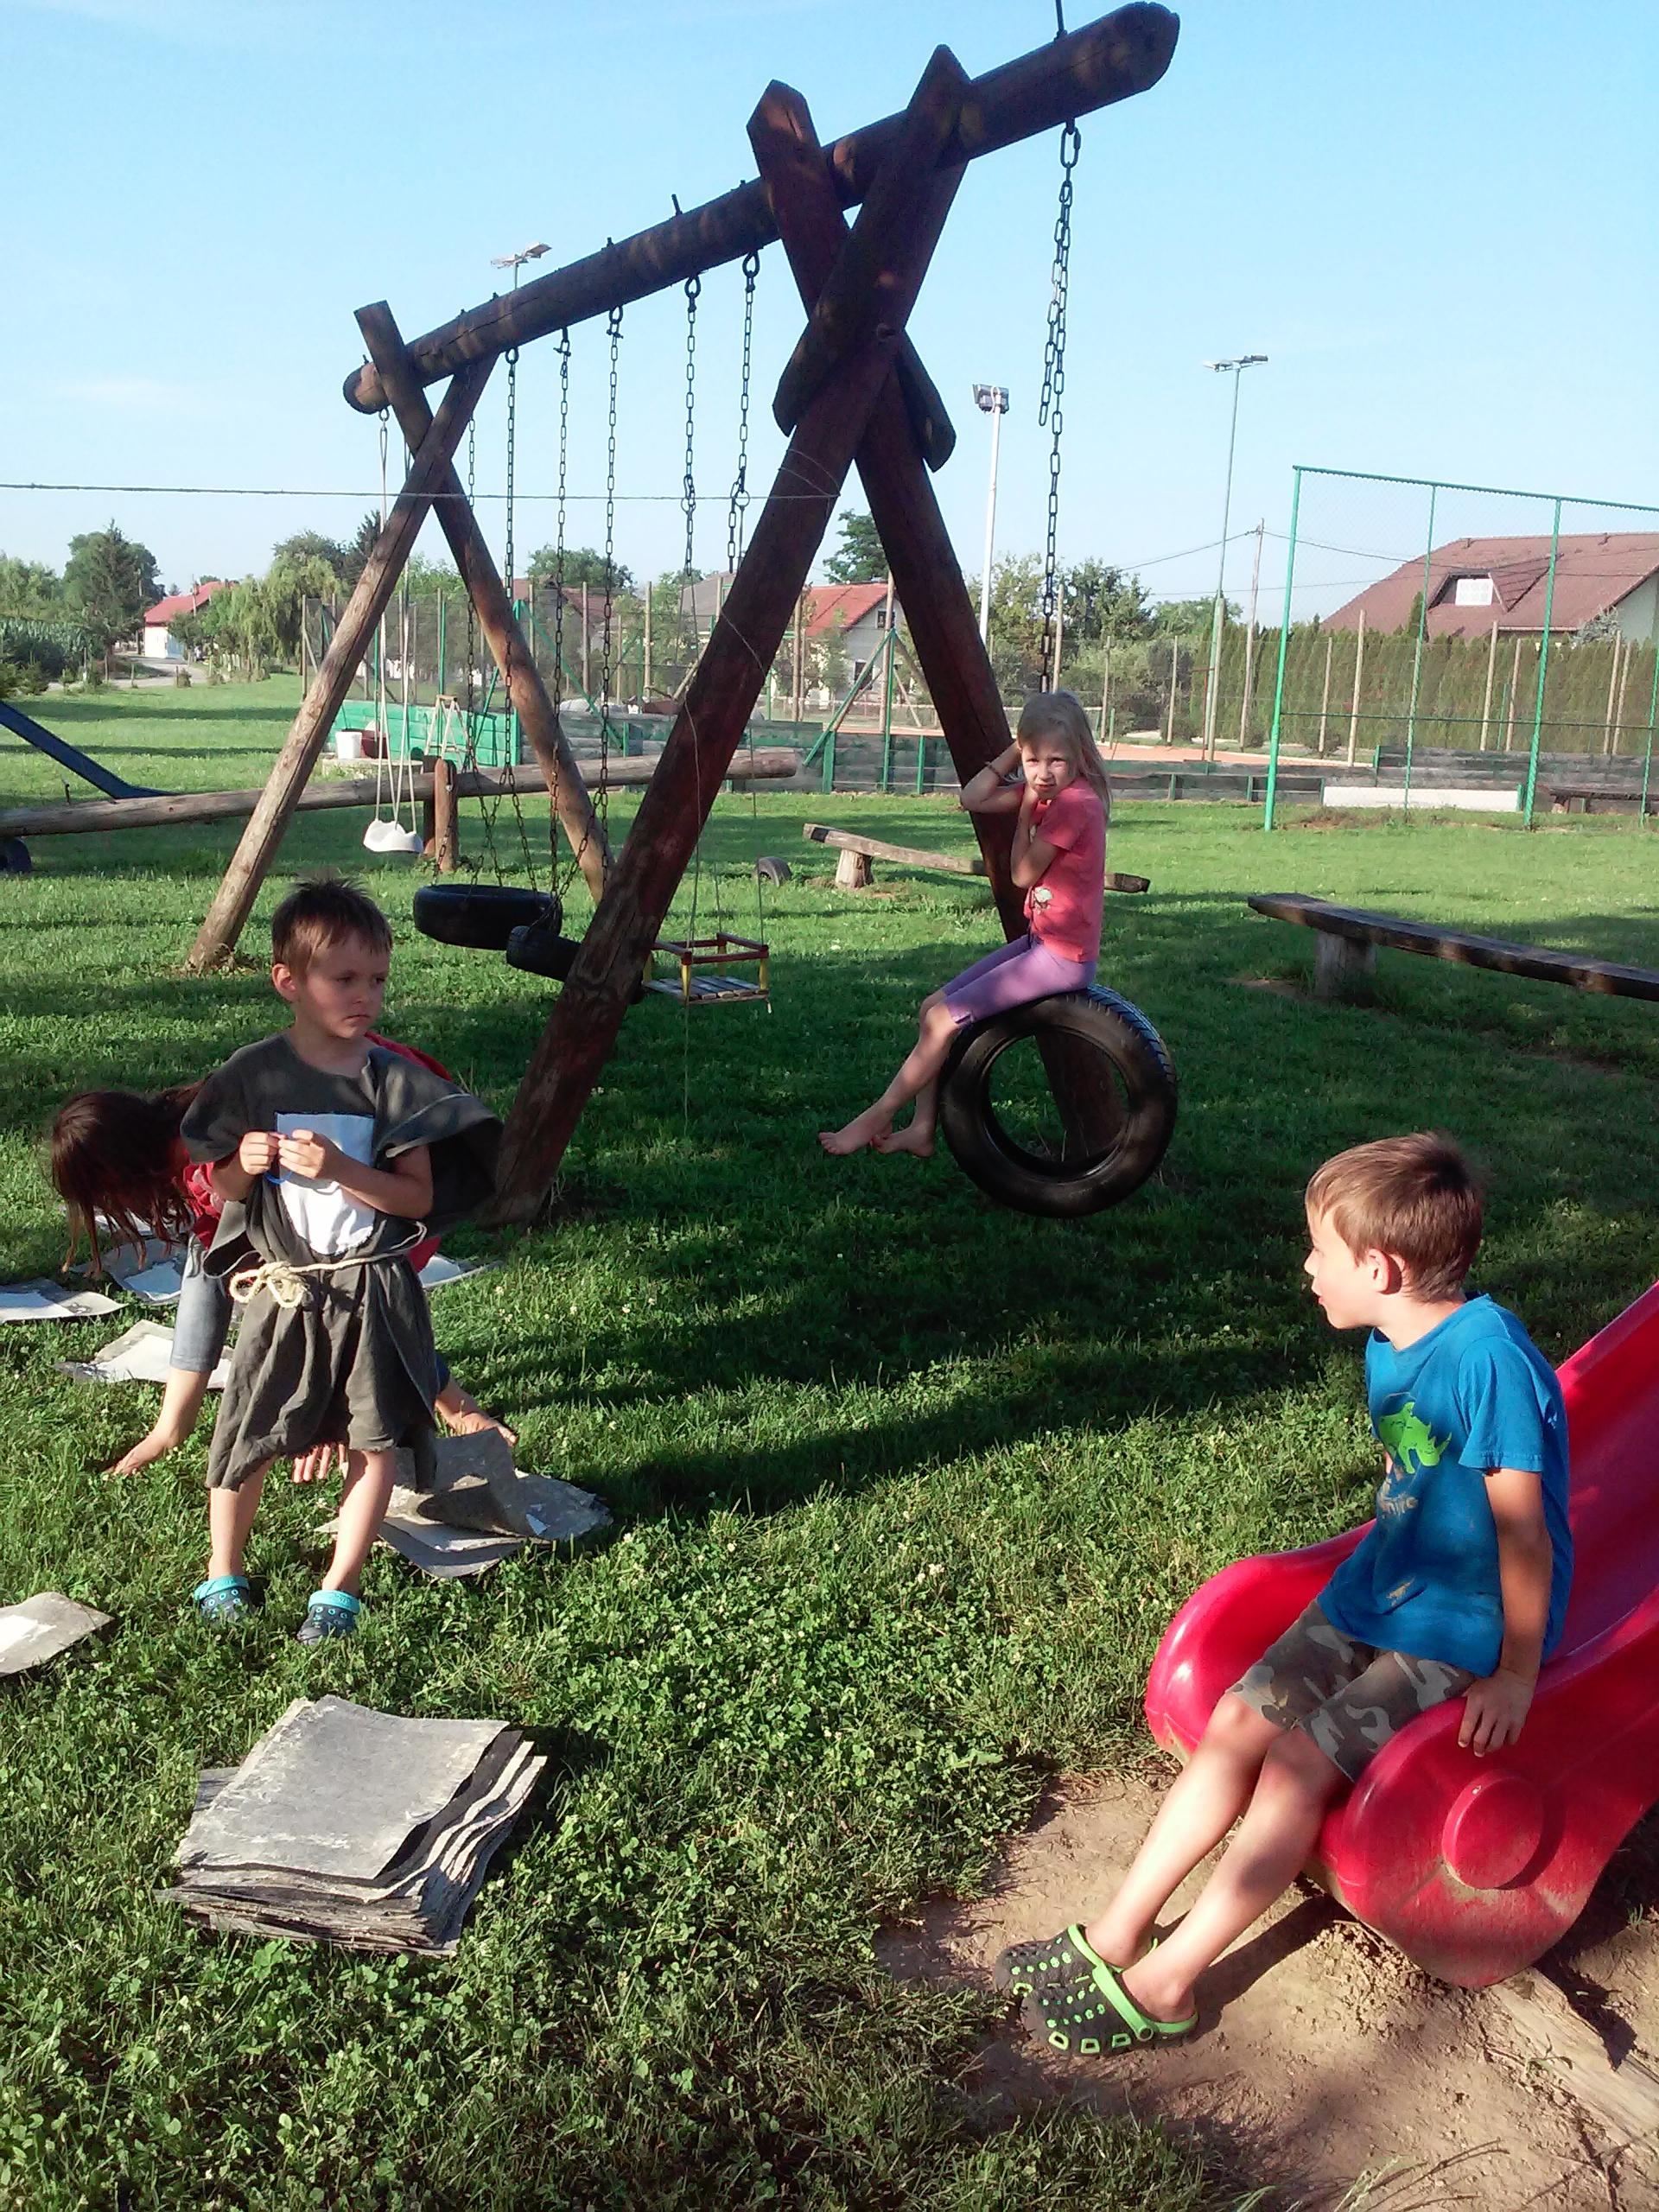 poletni-tabor-kud-prasila-h-srnec26-73